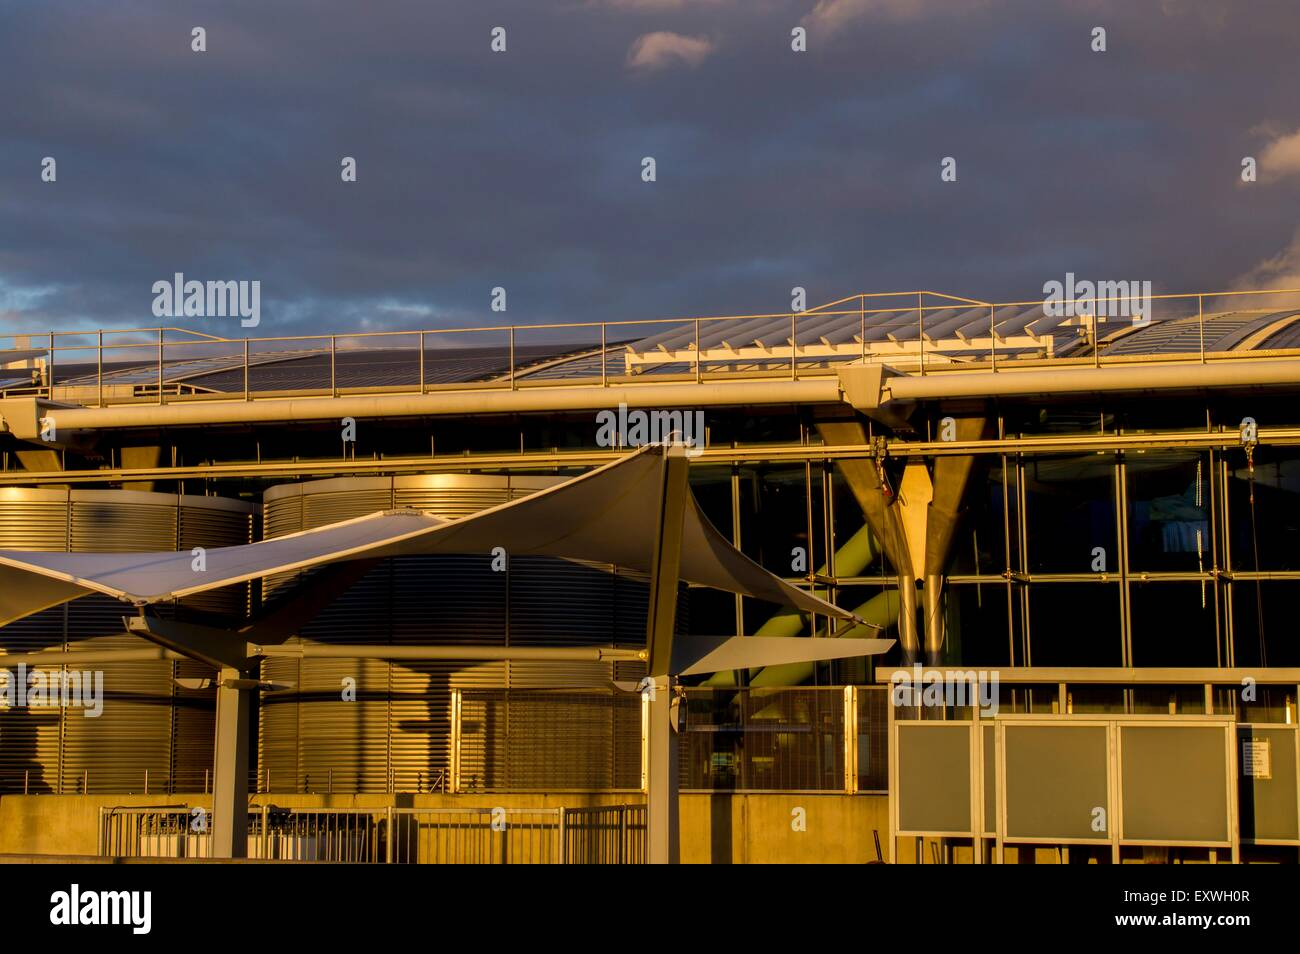 Airport, Heathrow, London, England, Great Britain, Europe Stock Photo